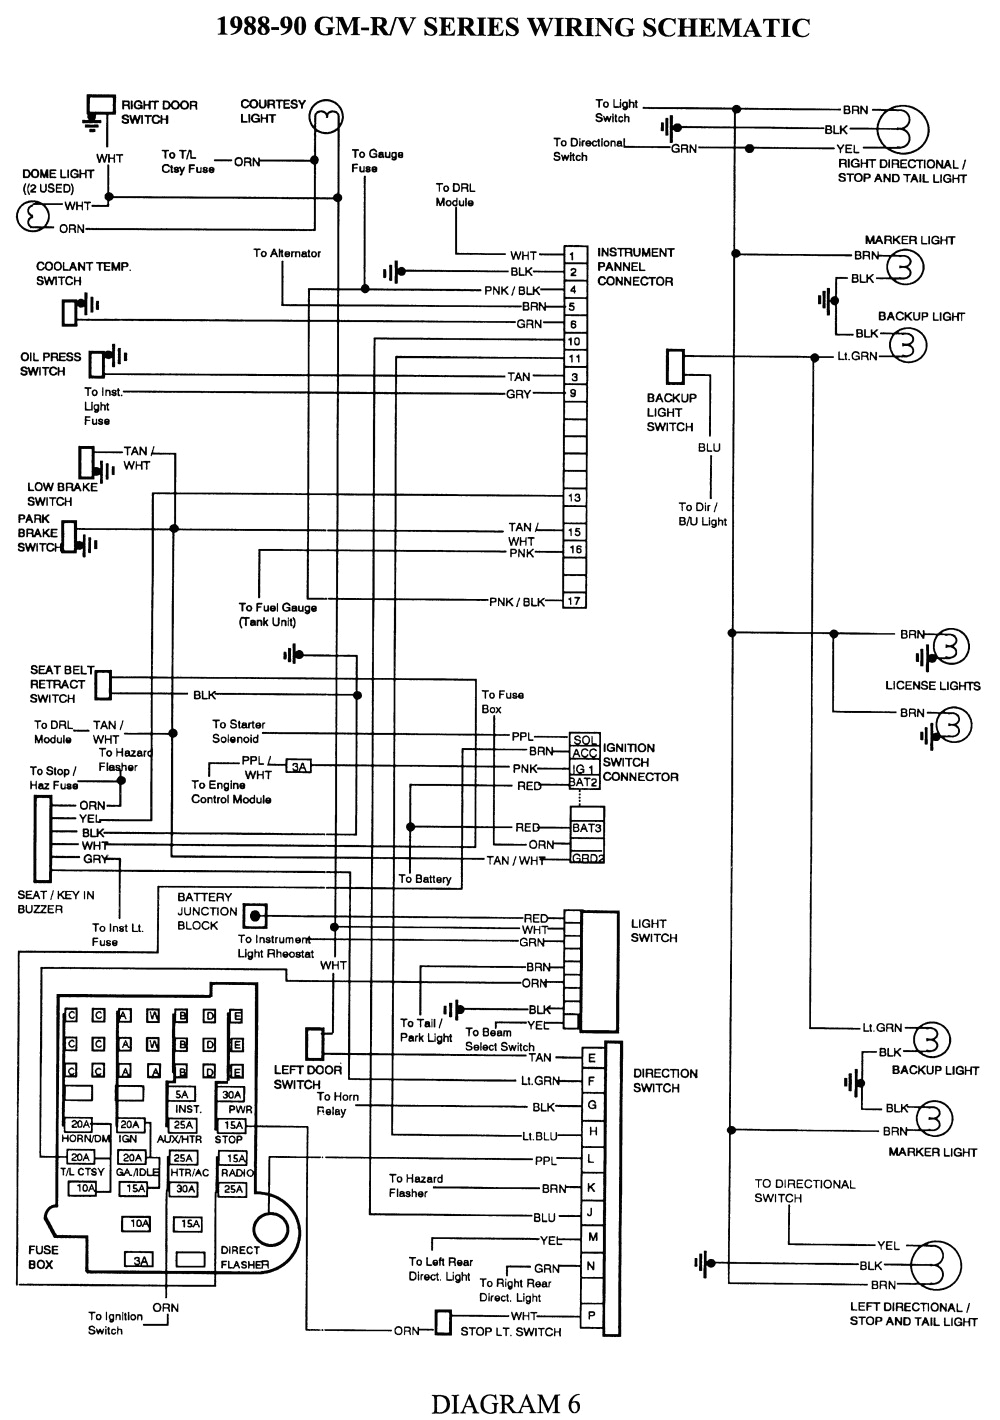 1989 Gmc Sierra Wiring Diagram 1989 Gmc Back Up Light Wiring Wiring Diagram Used